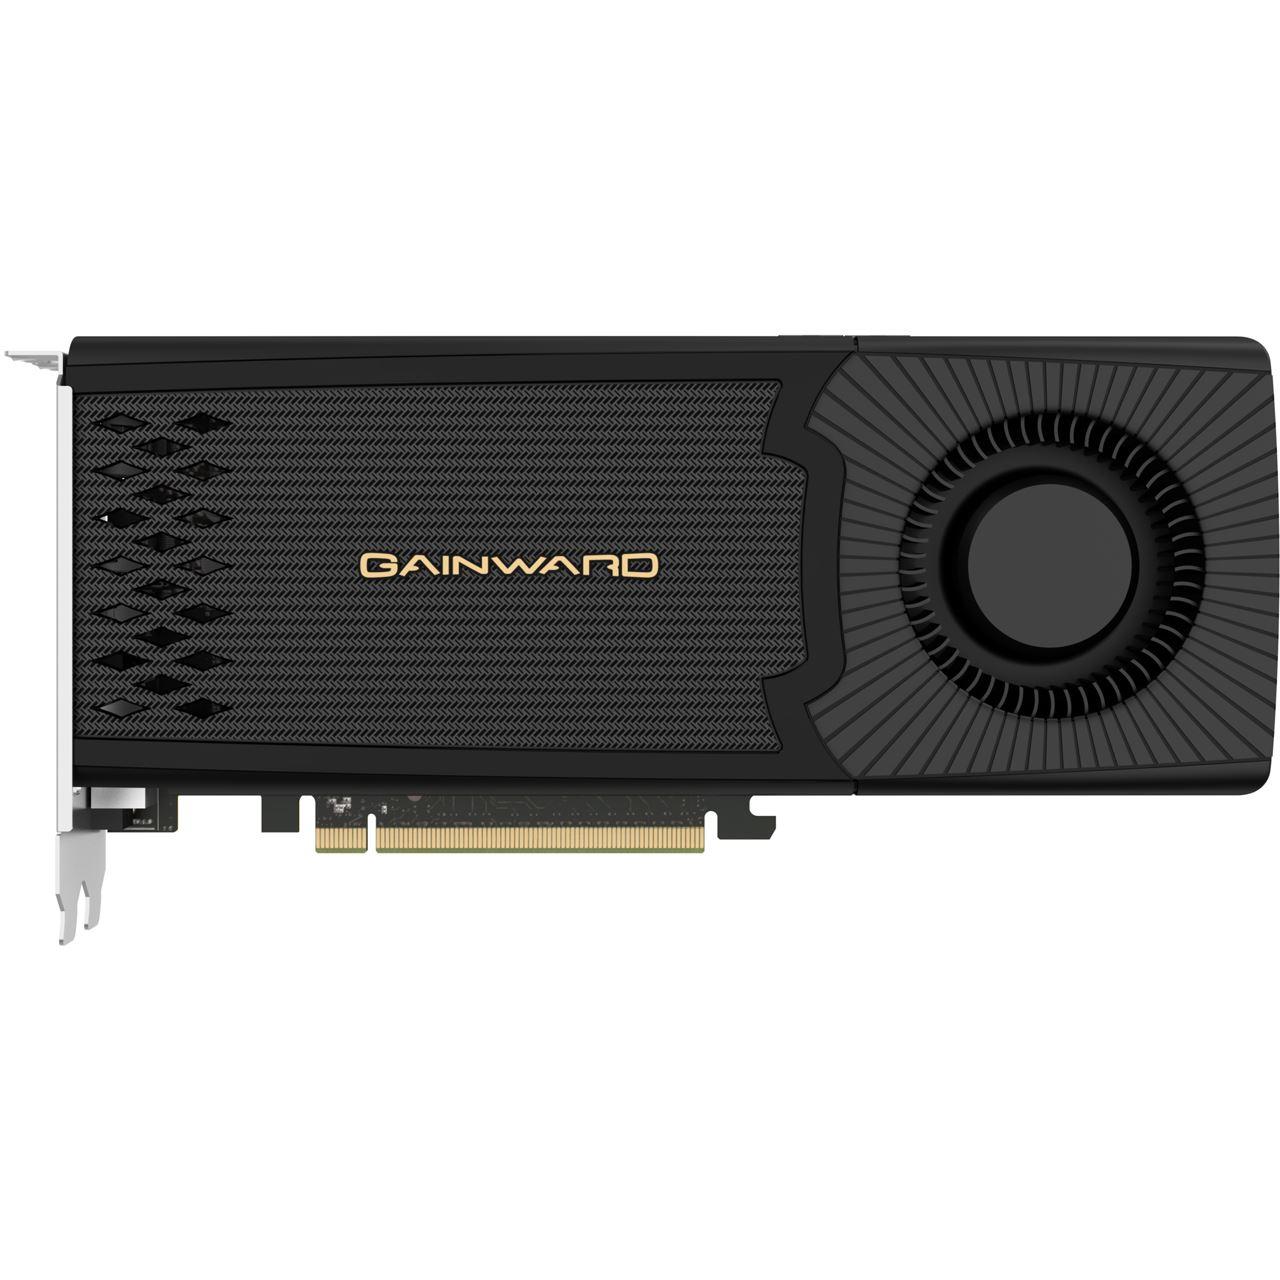 gainward geforce gtx 970 4gb review